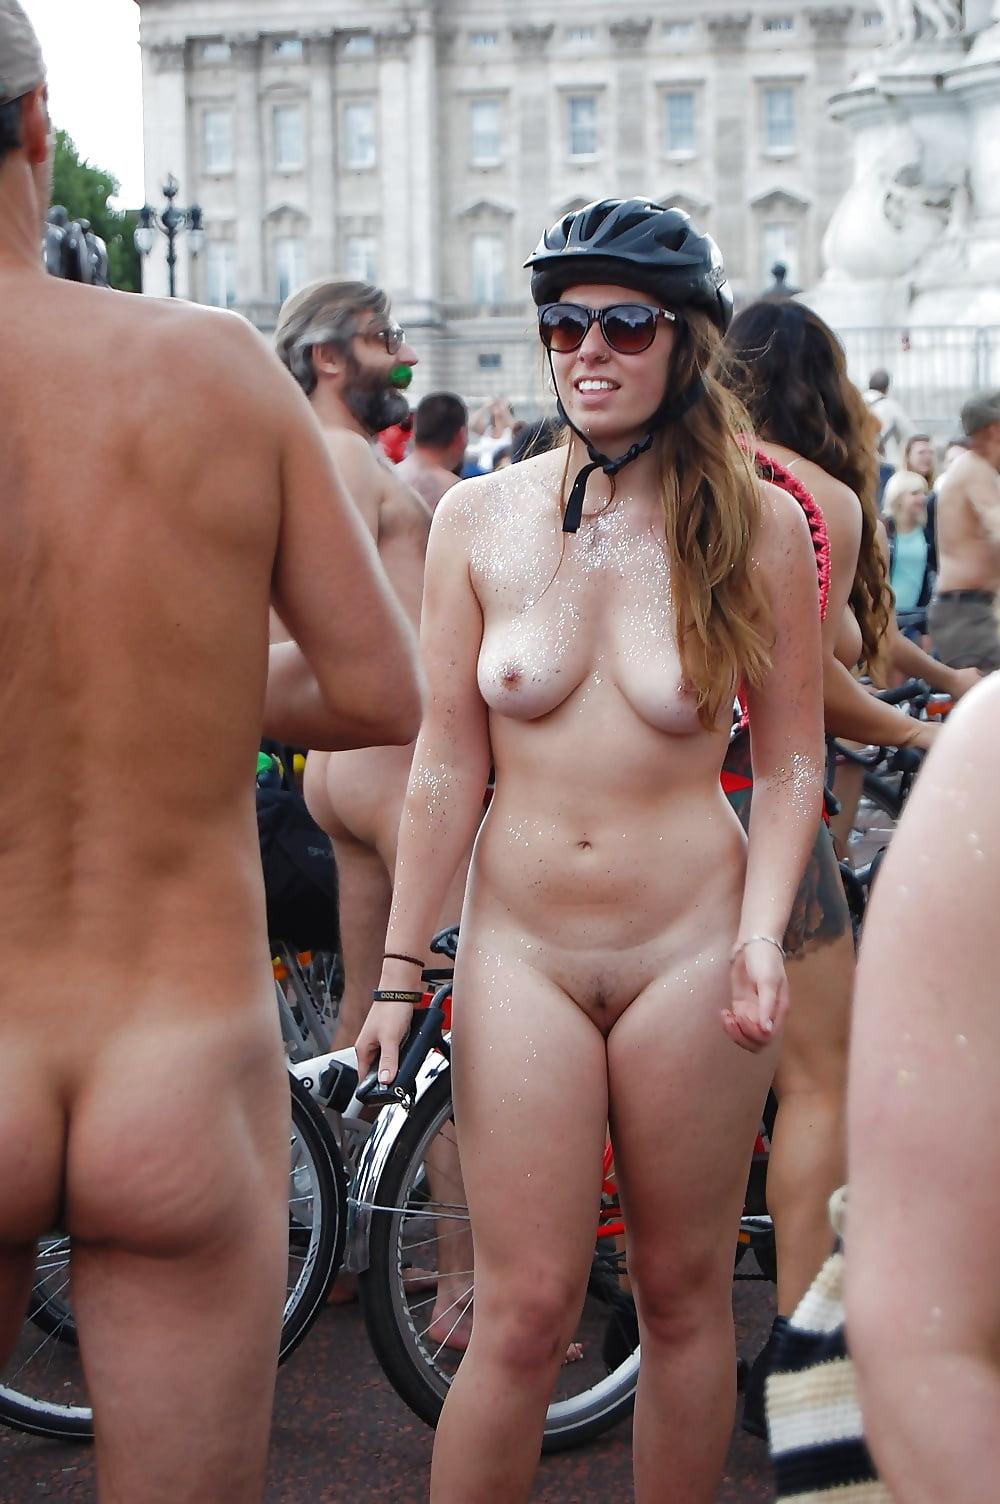 World Naked Bike Ride - 99 Fotos - Xhamstercom-9931